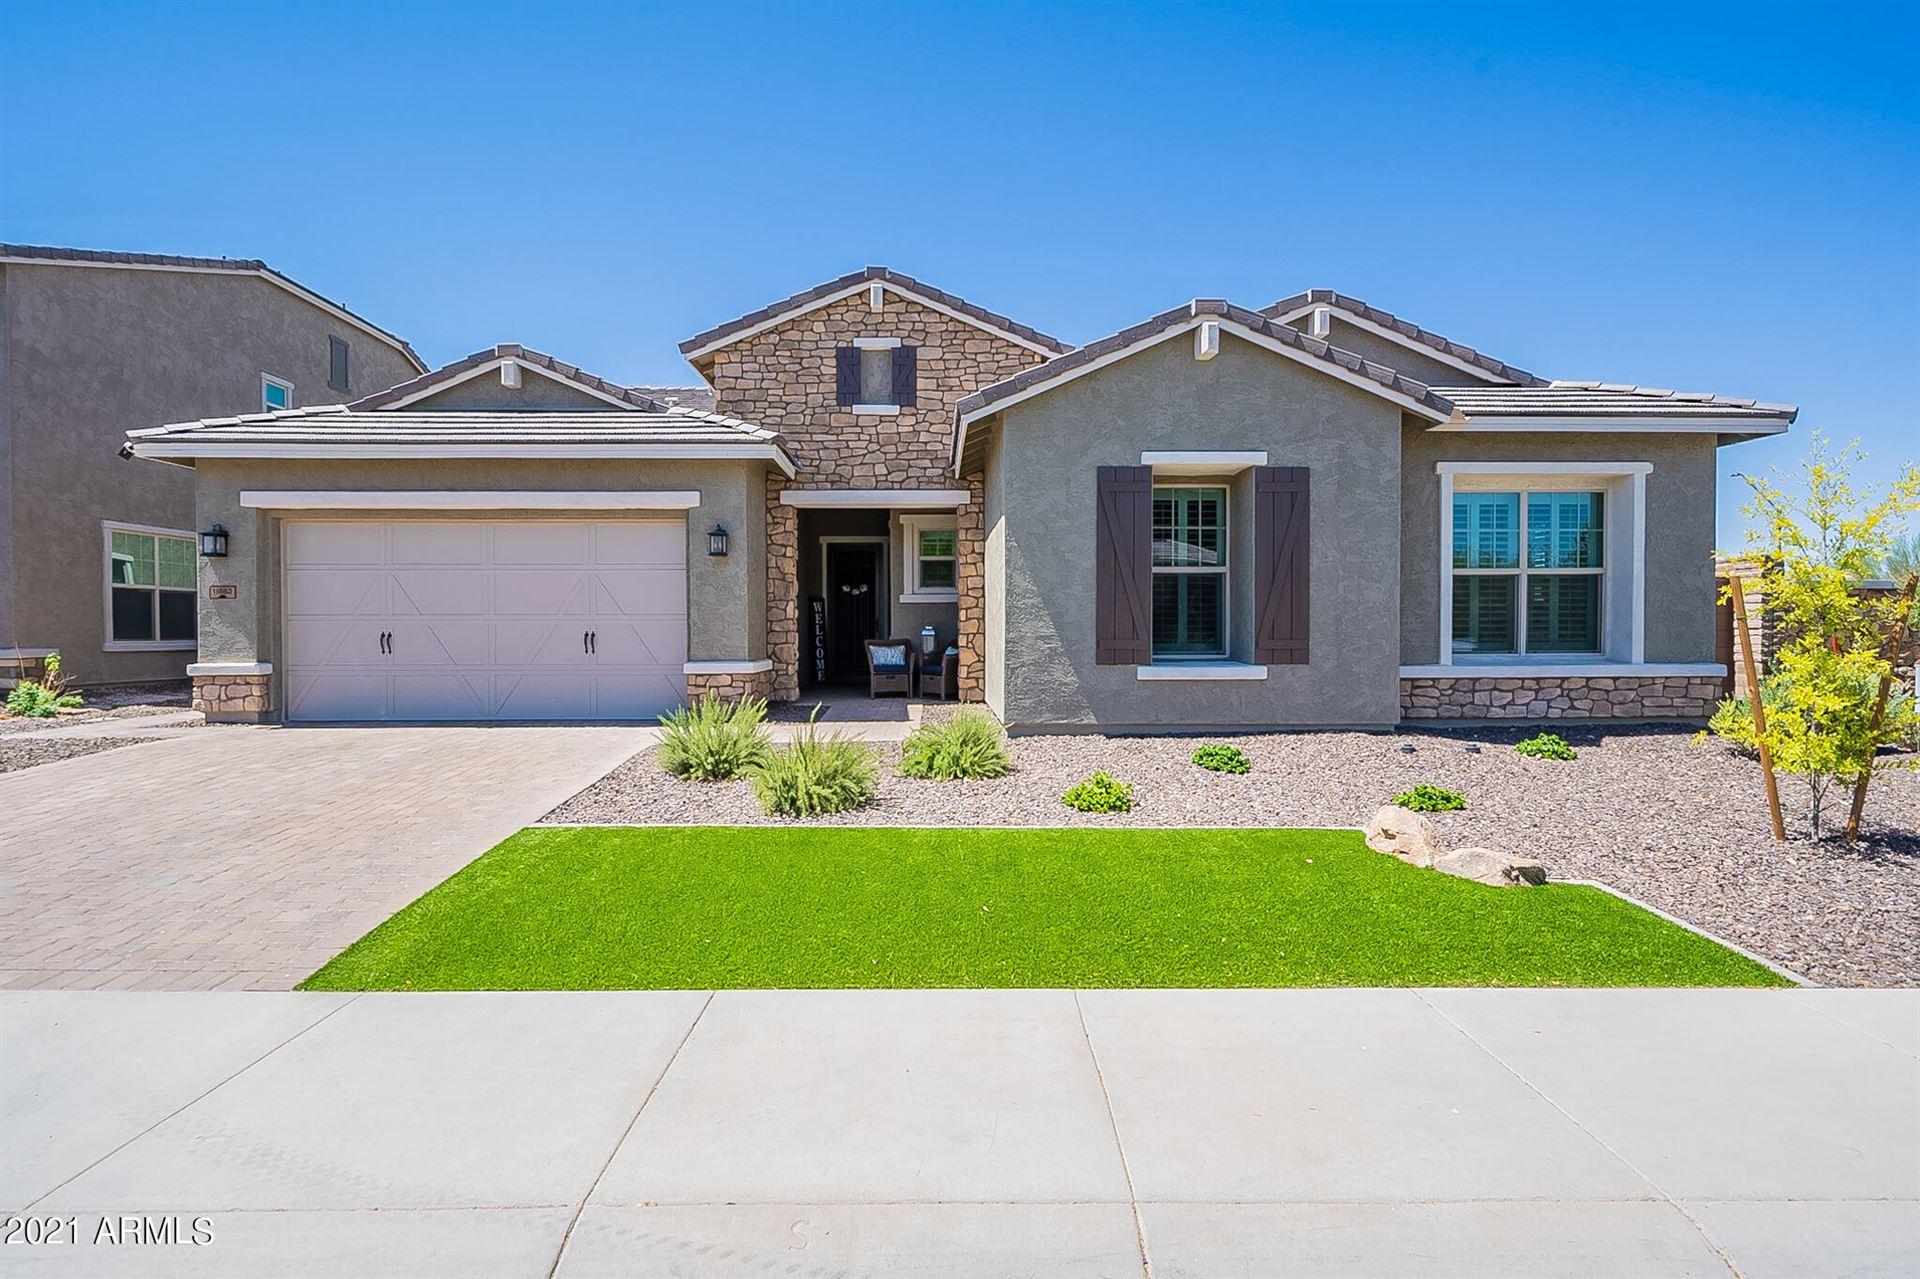 11883 W Morning Vista Drive, Peoria, AZ 85383 - MLS#: 6247523